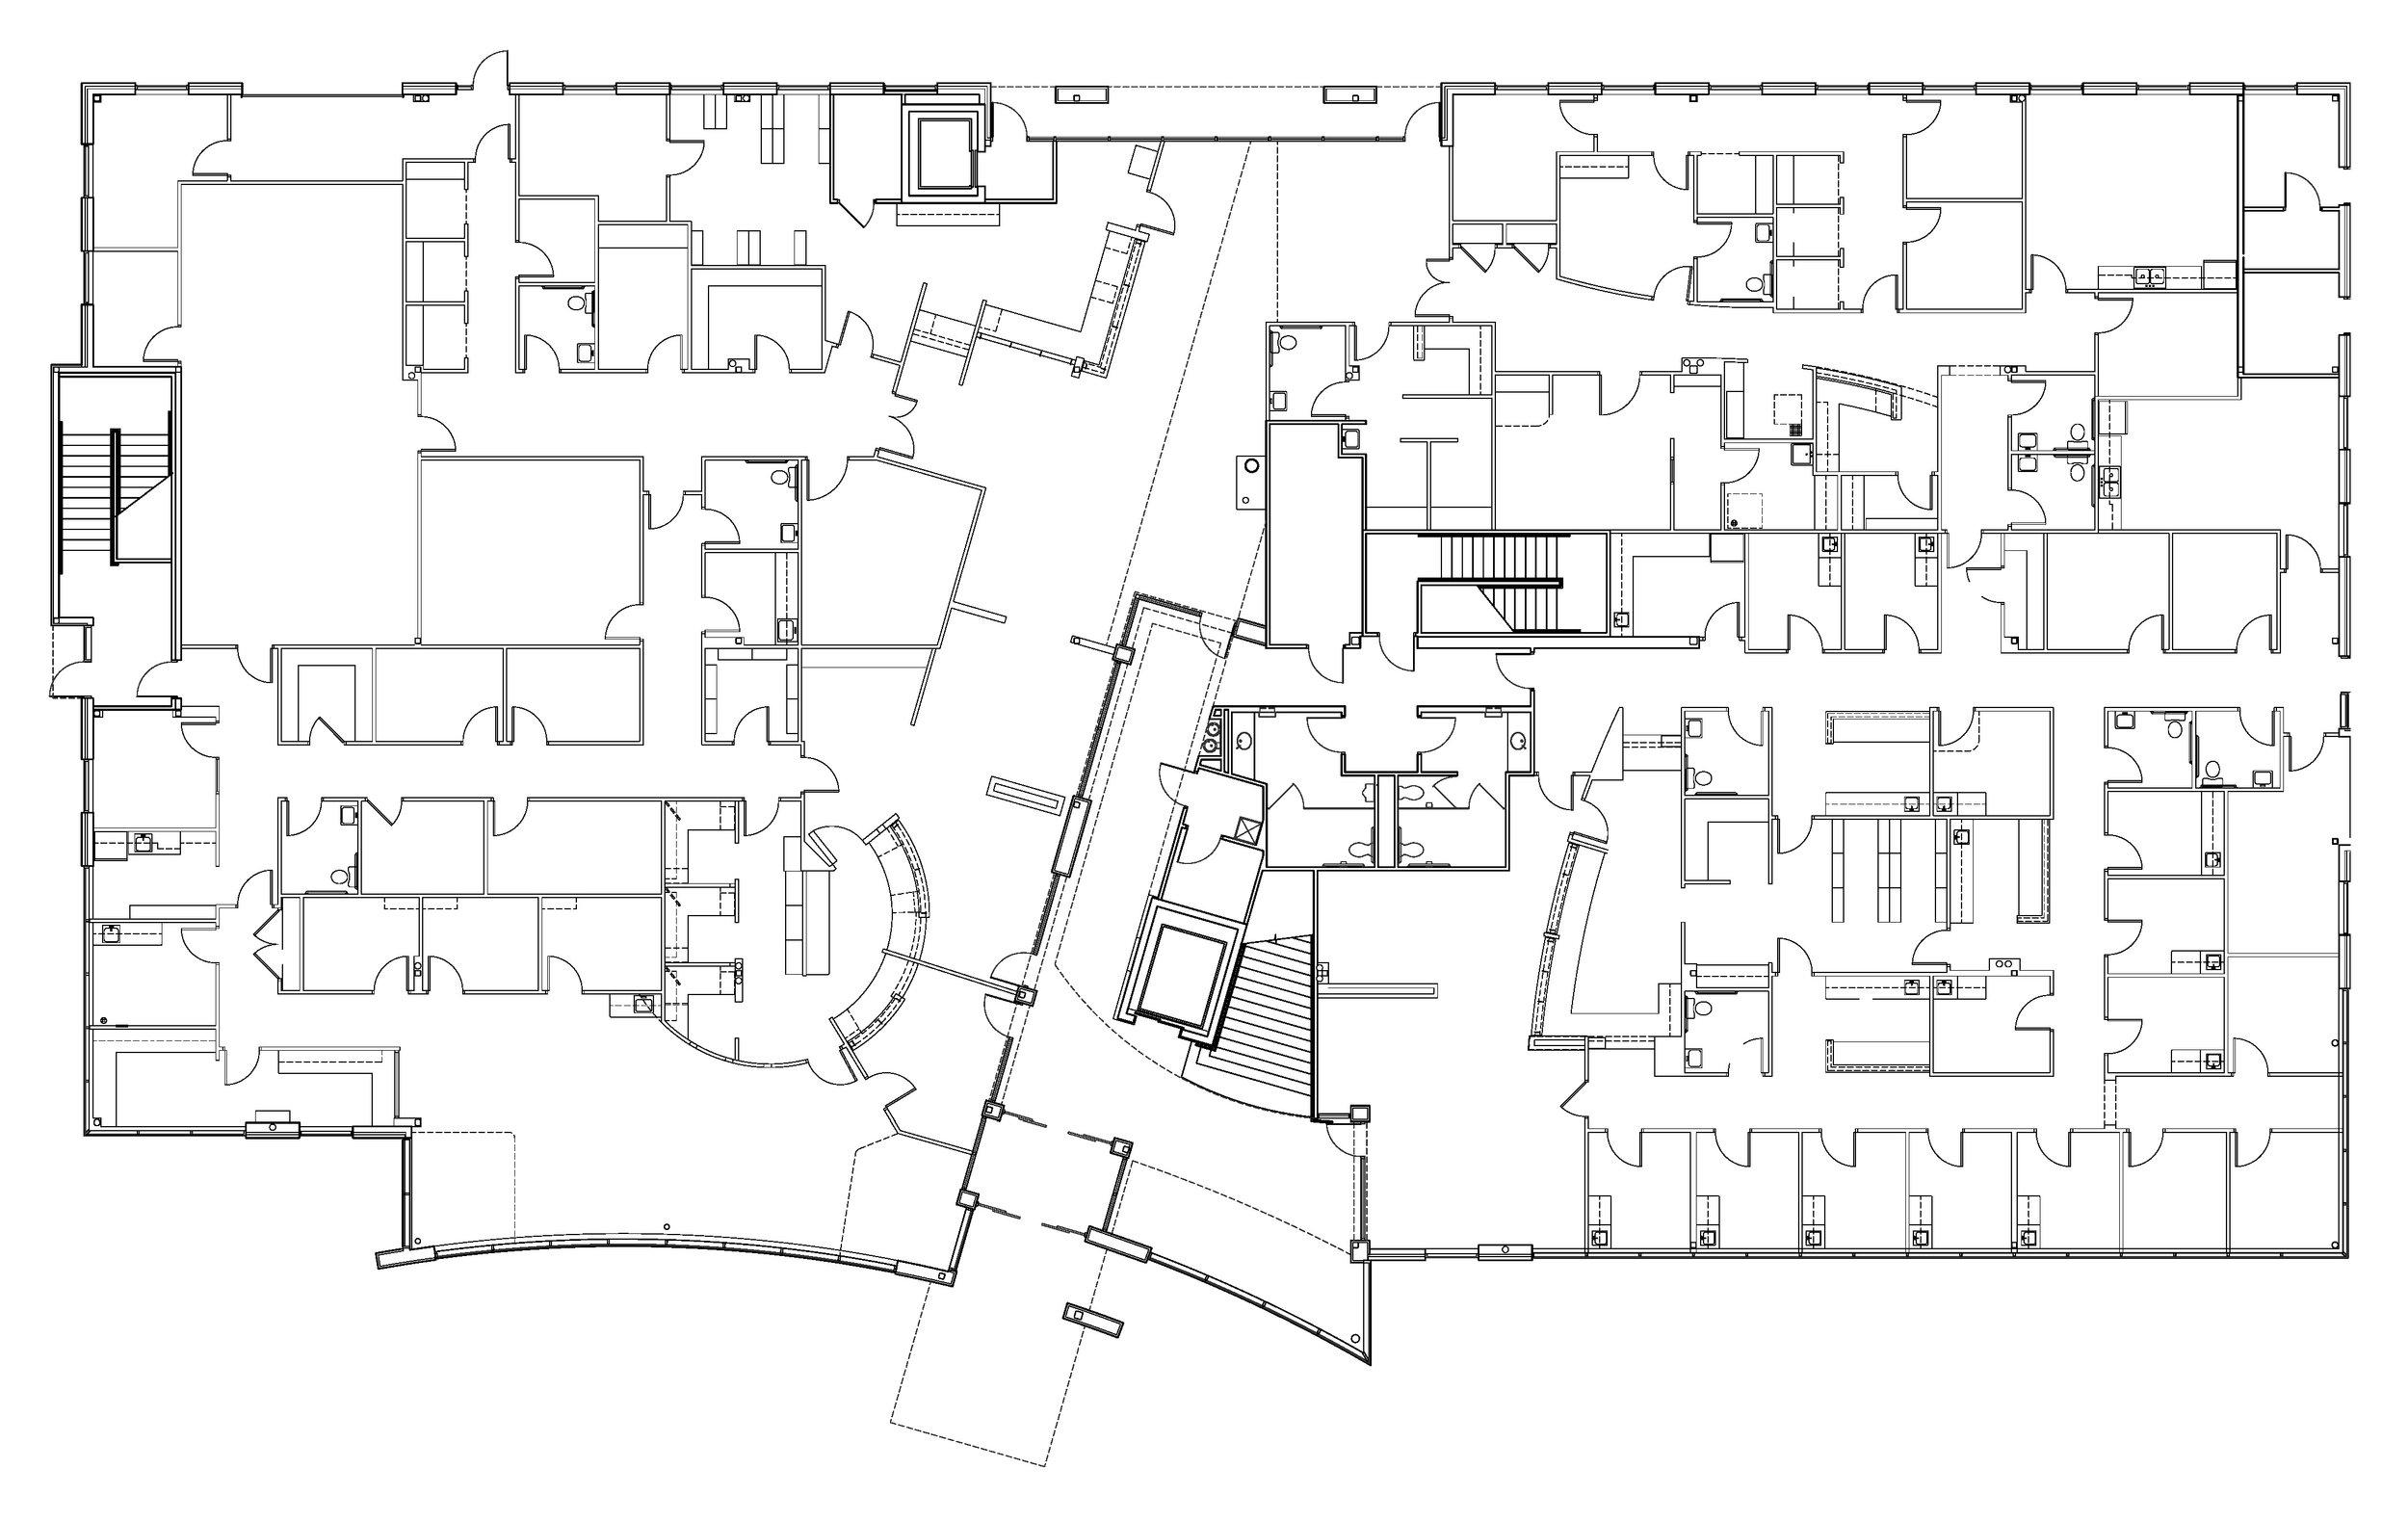 Greenbrier Healthplex Plan.jpg